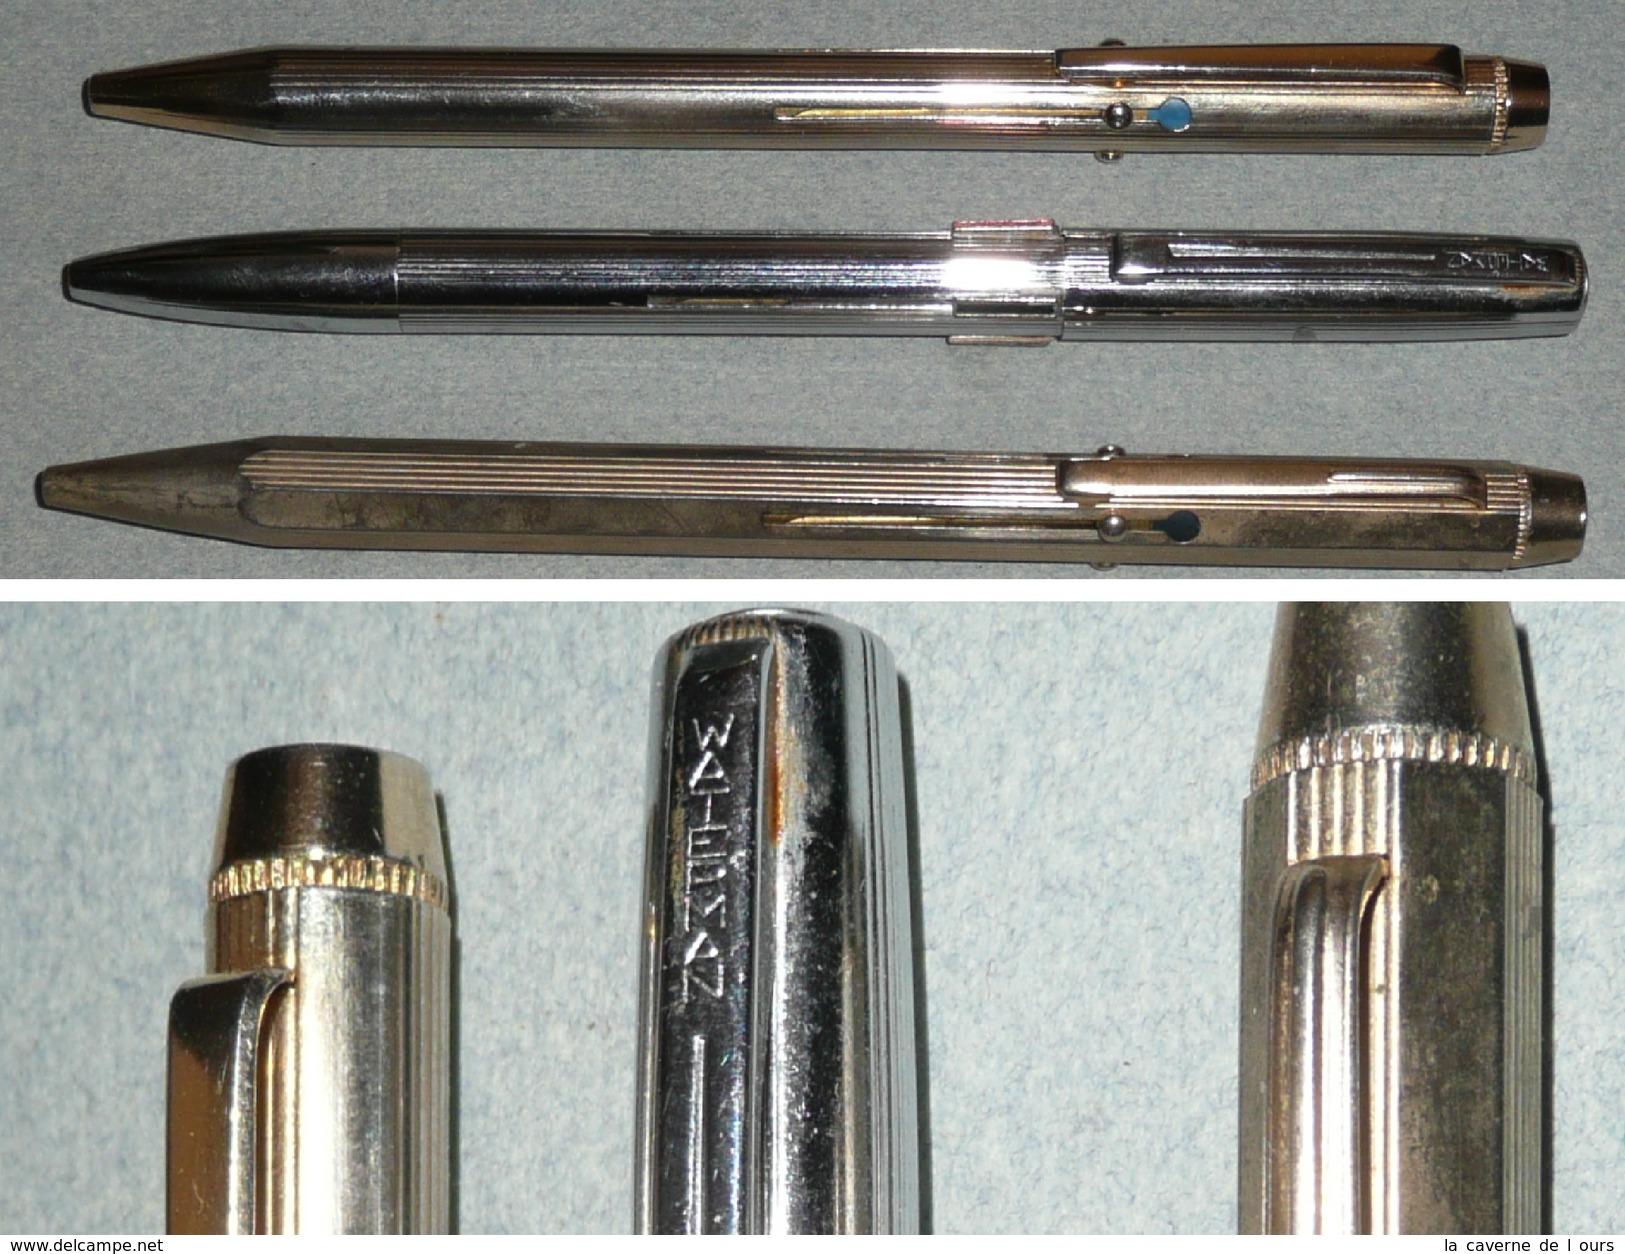 stylo waterman 4 couleurs